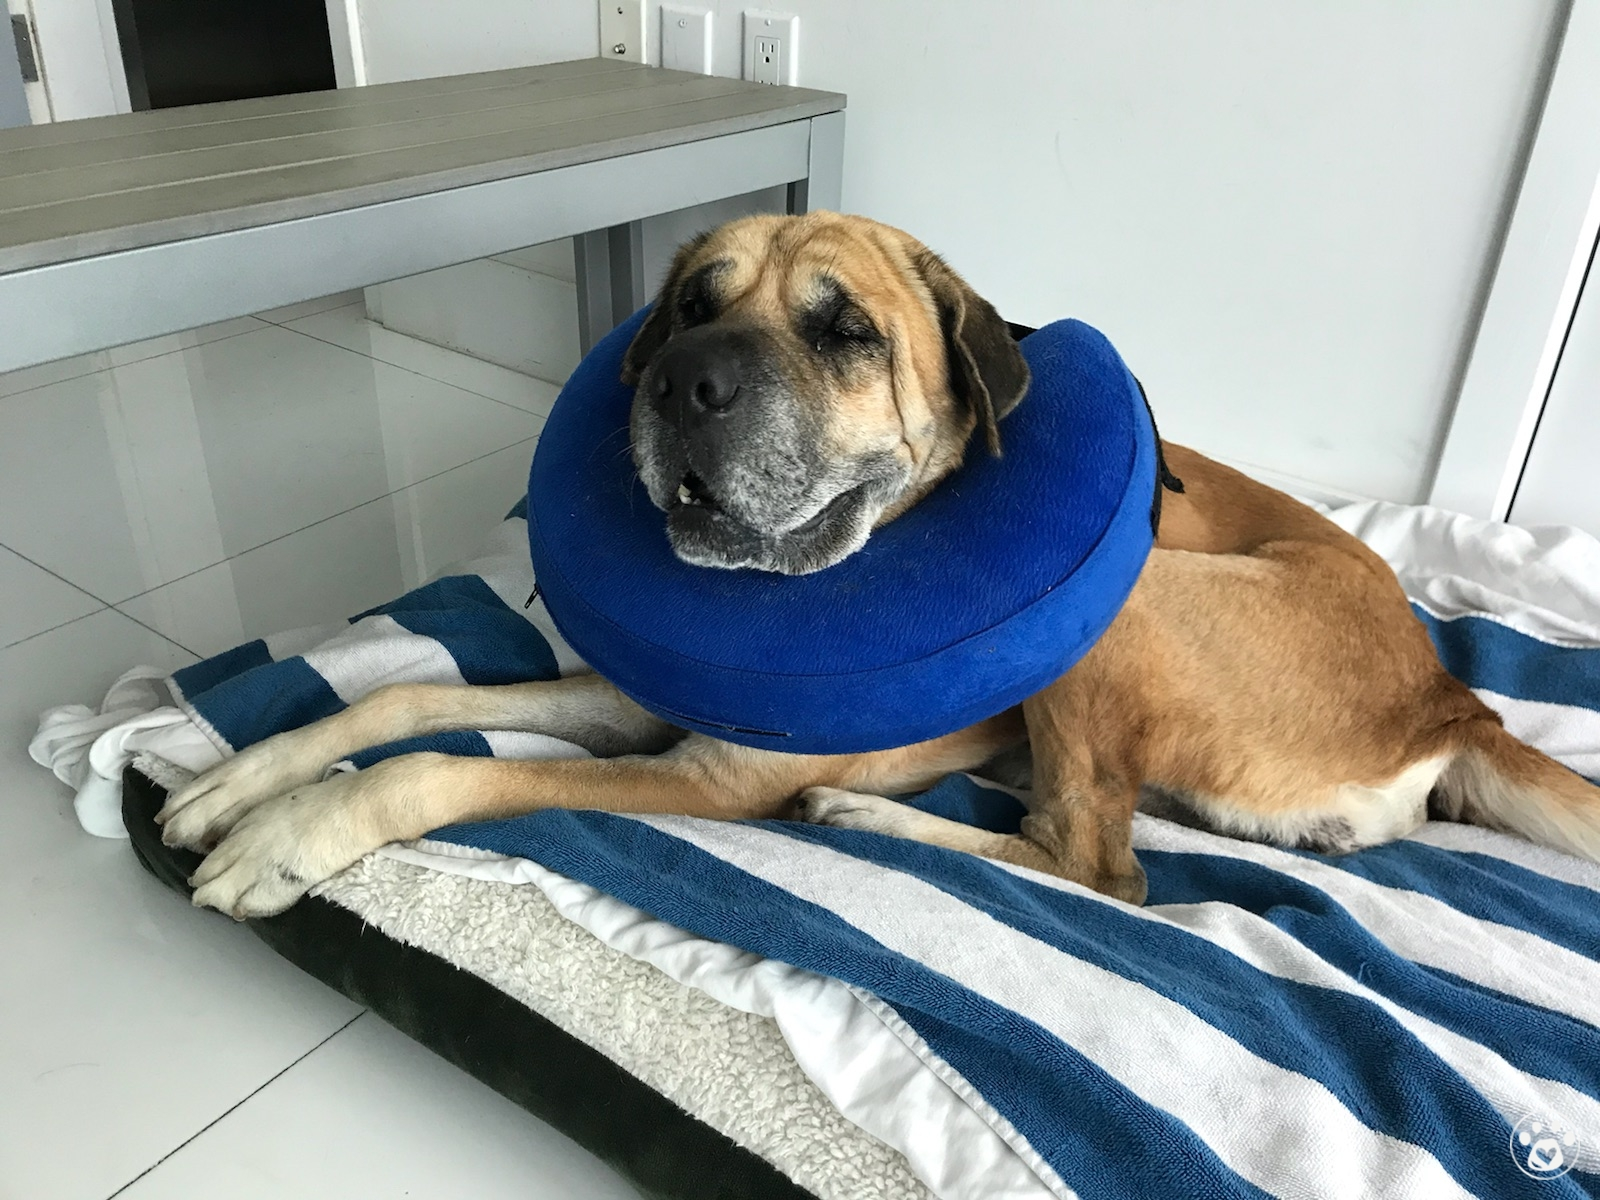 Duke The Senior needs surgeries